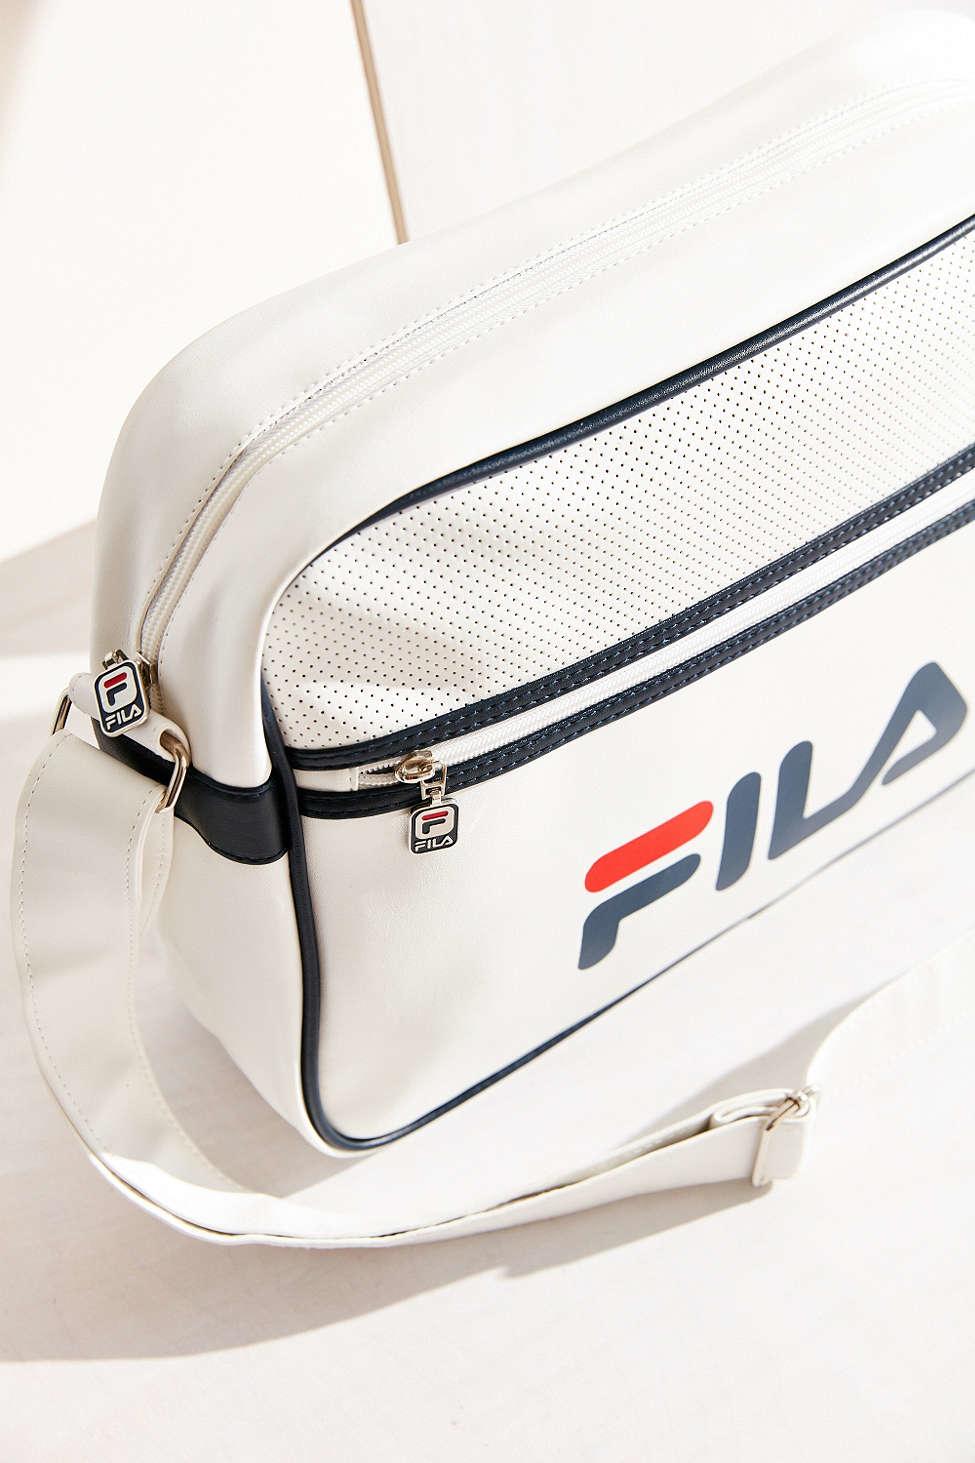 5b2077b1b7 Fila + Uo Docena Messenger Bag in White - Lyst